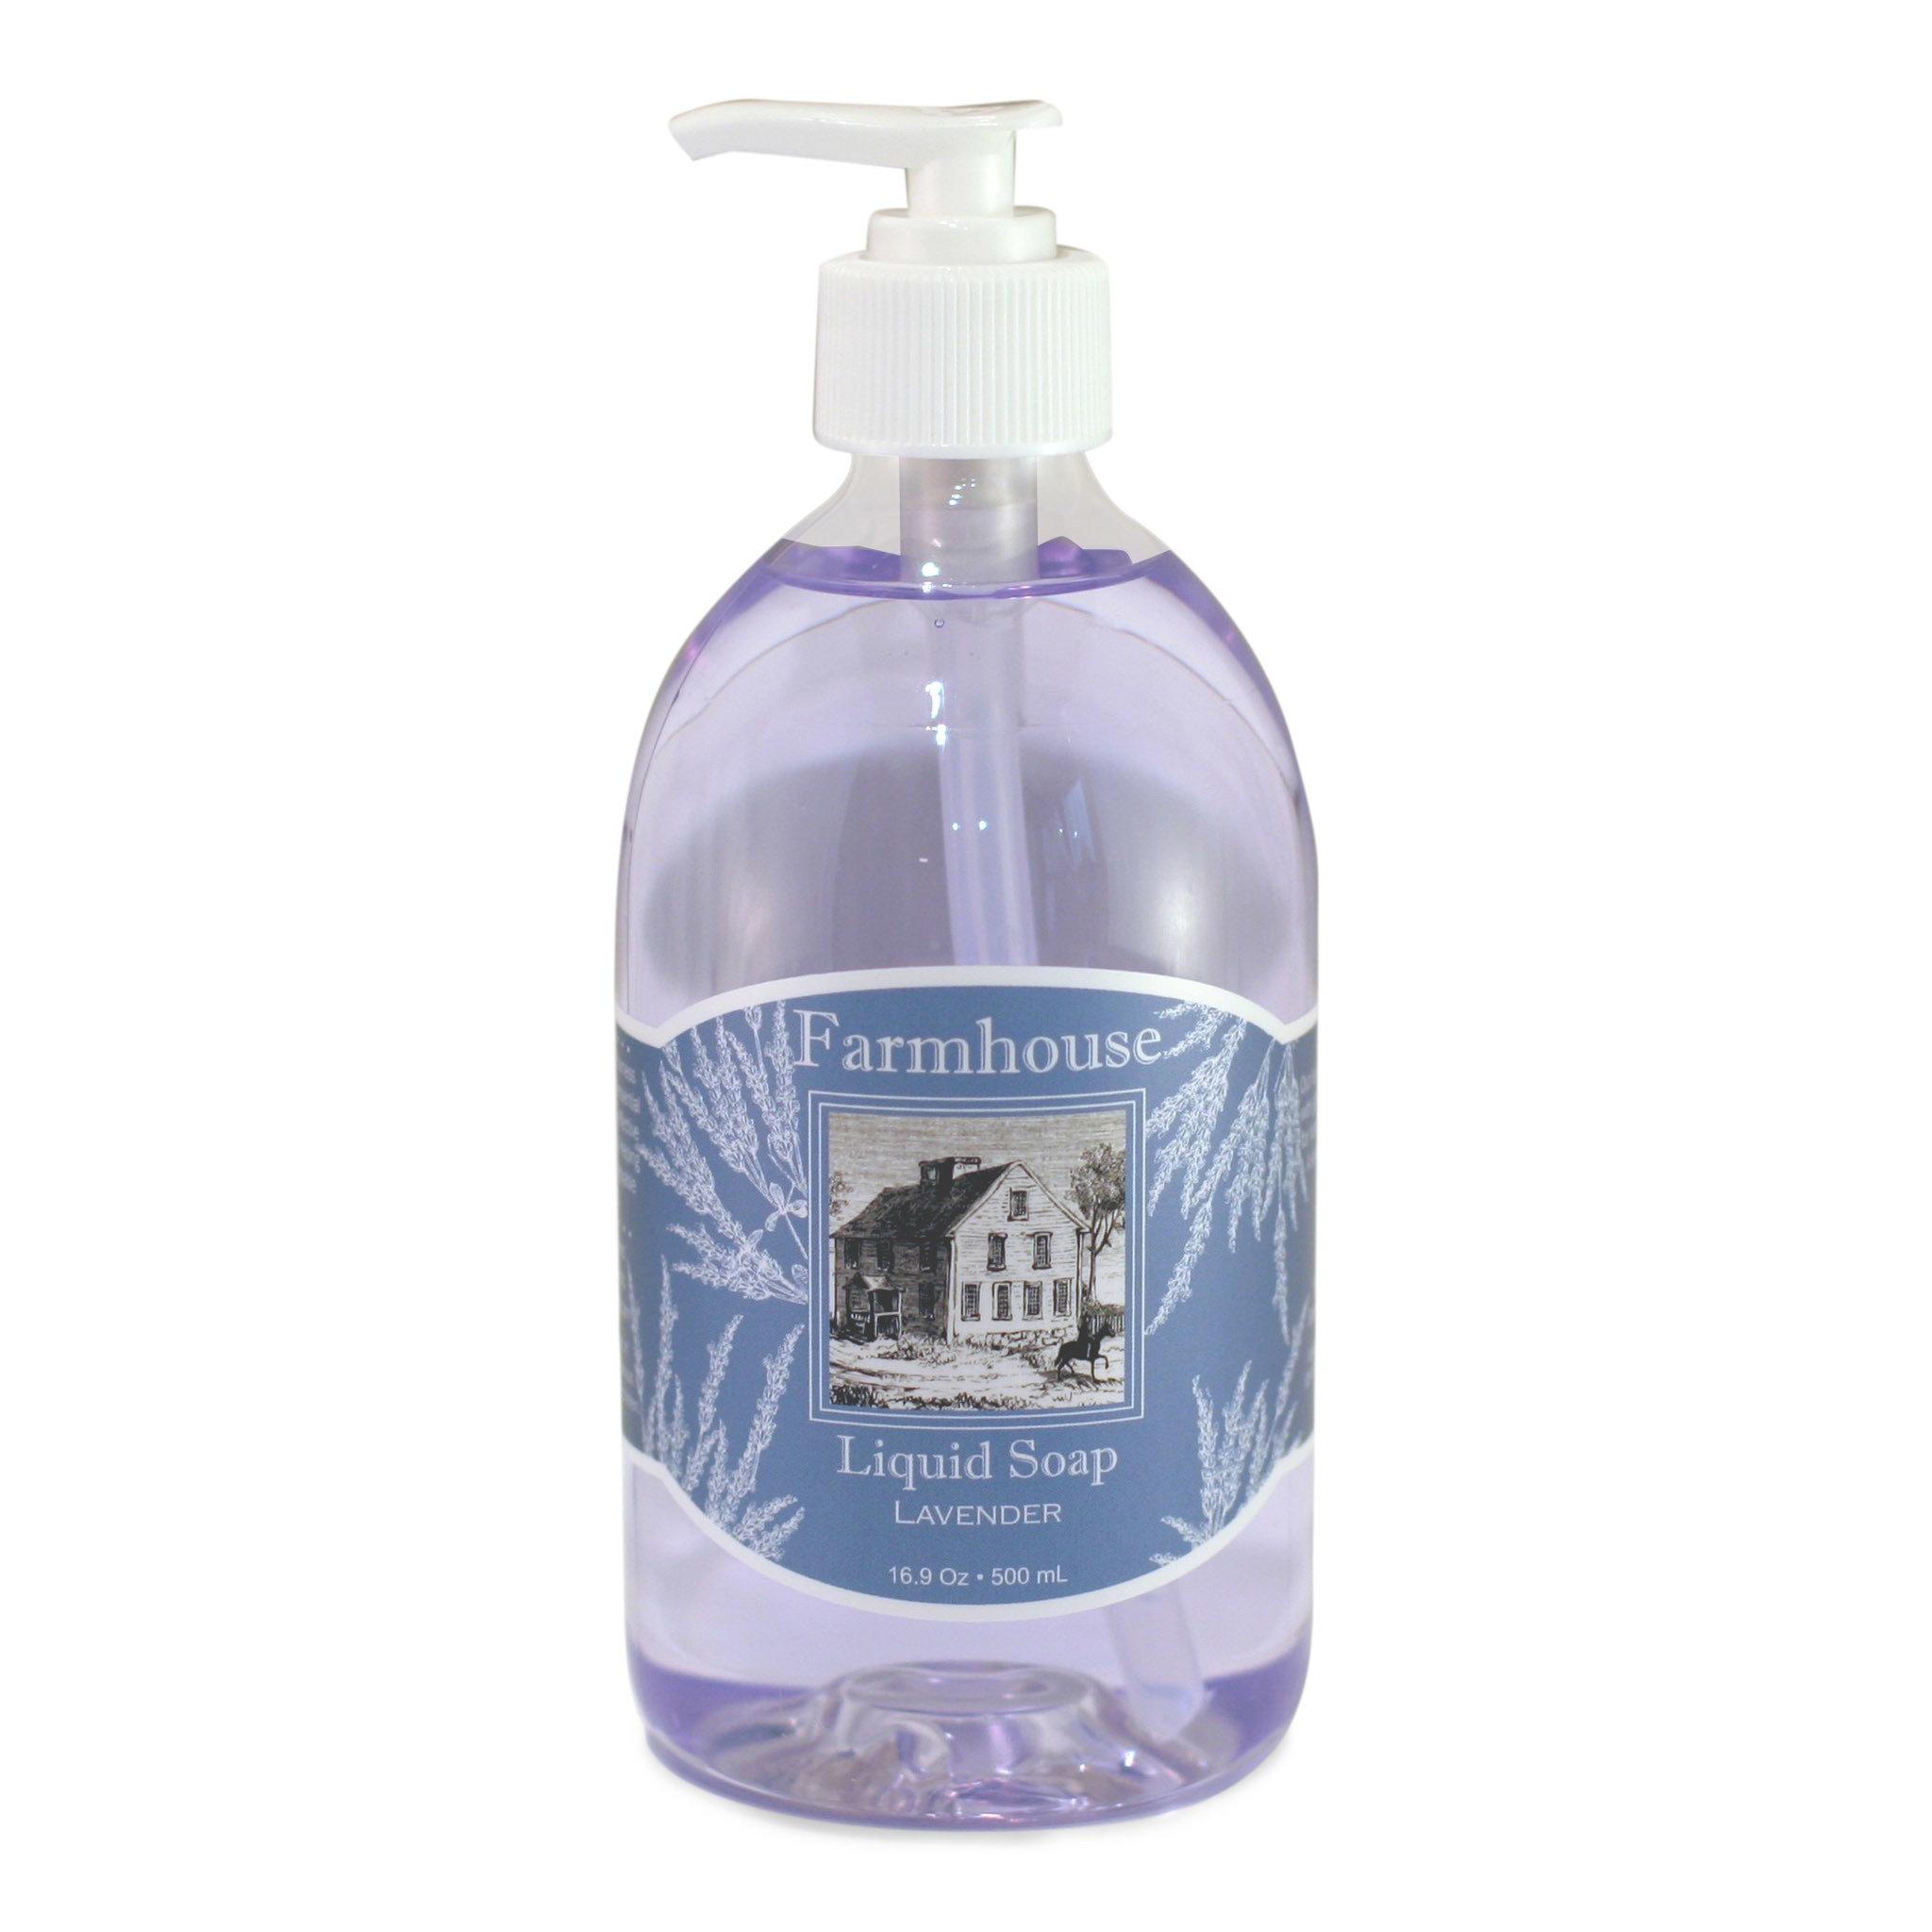 Farmhouse Lavender Liquid Soap XJ22YXX8YHYHC